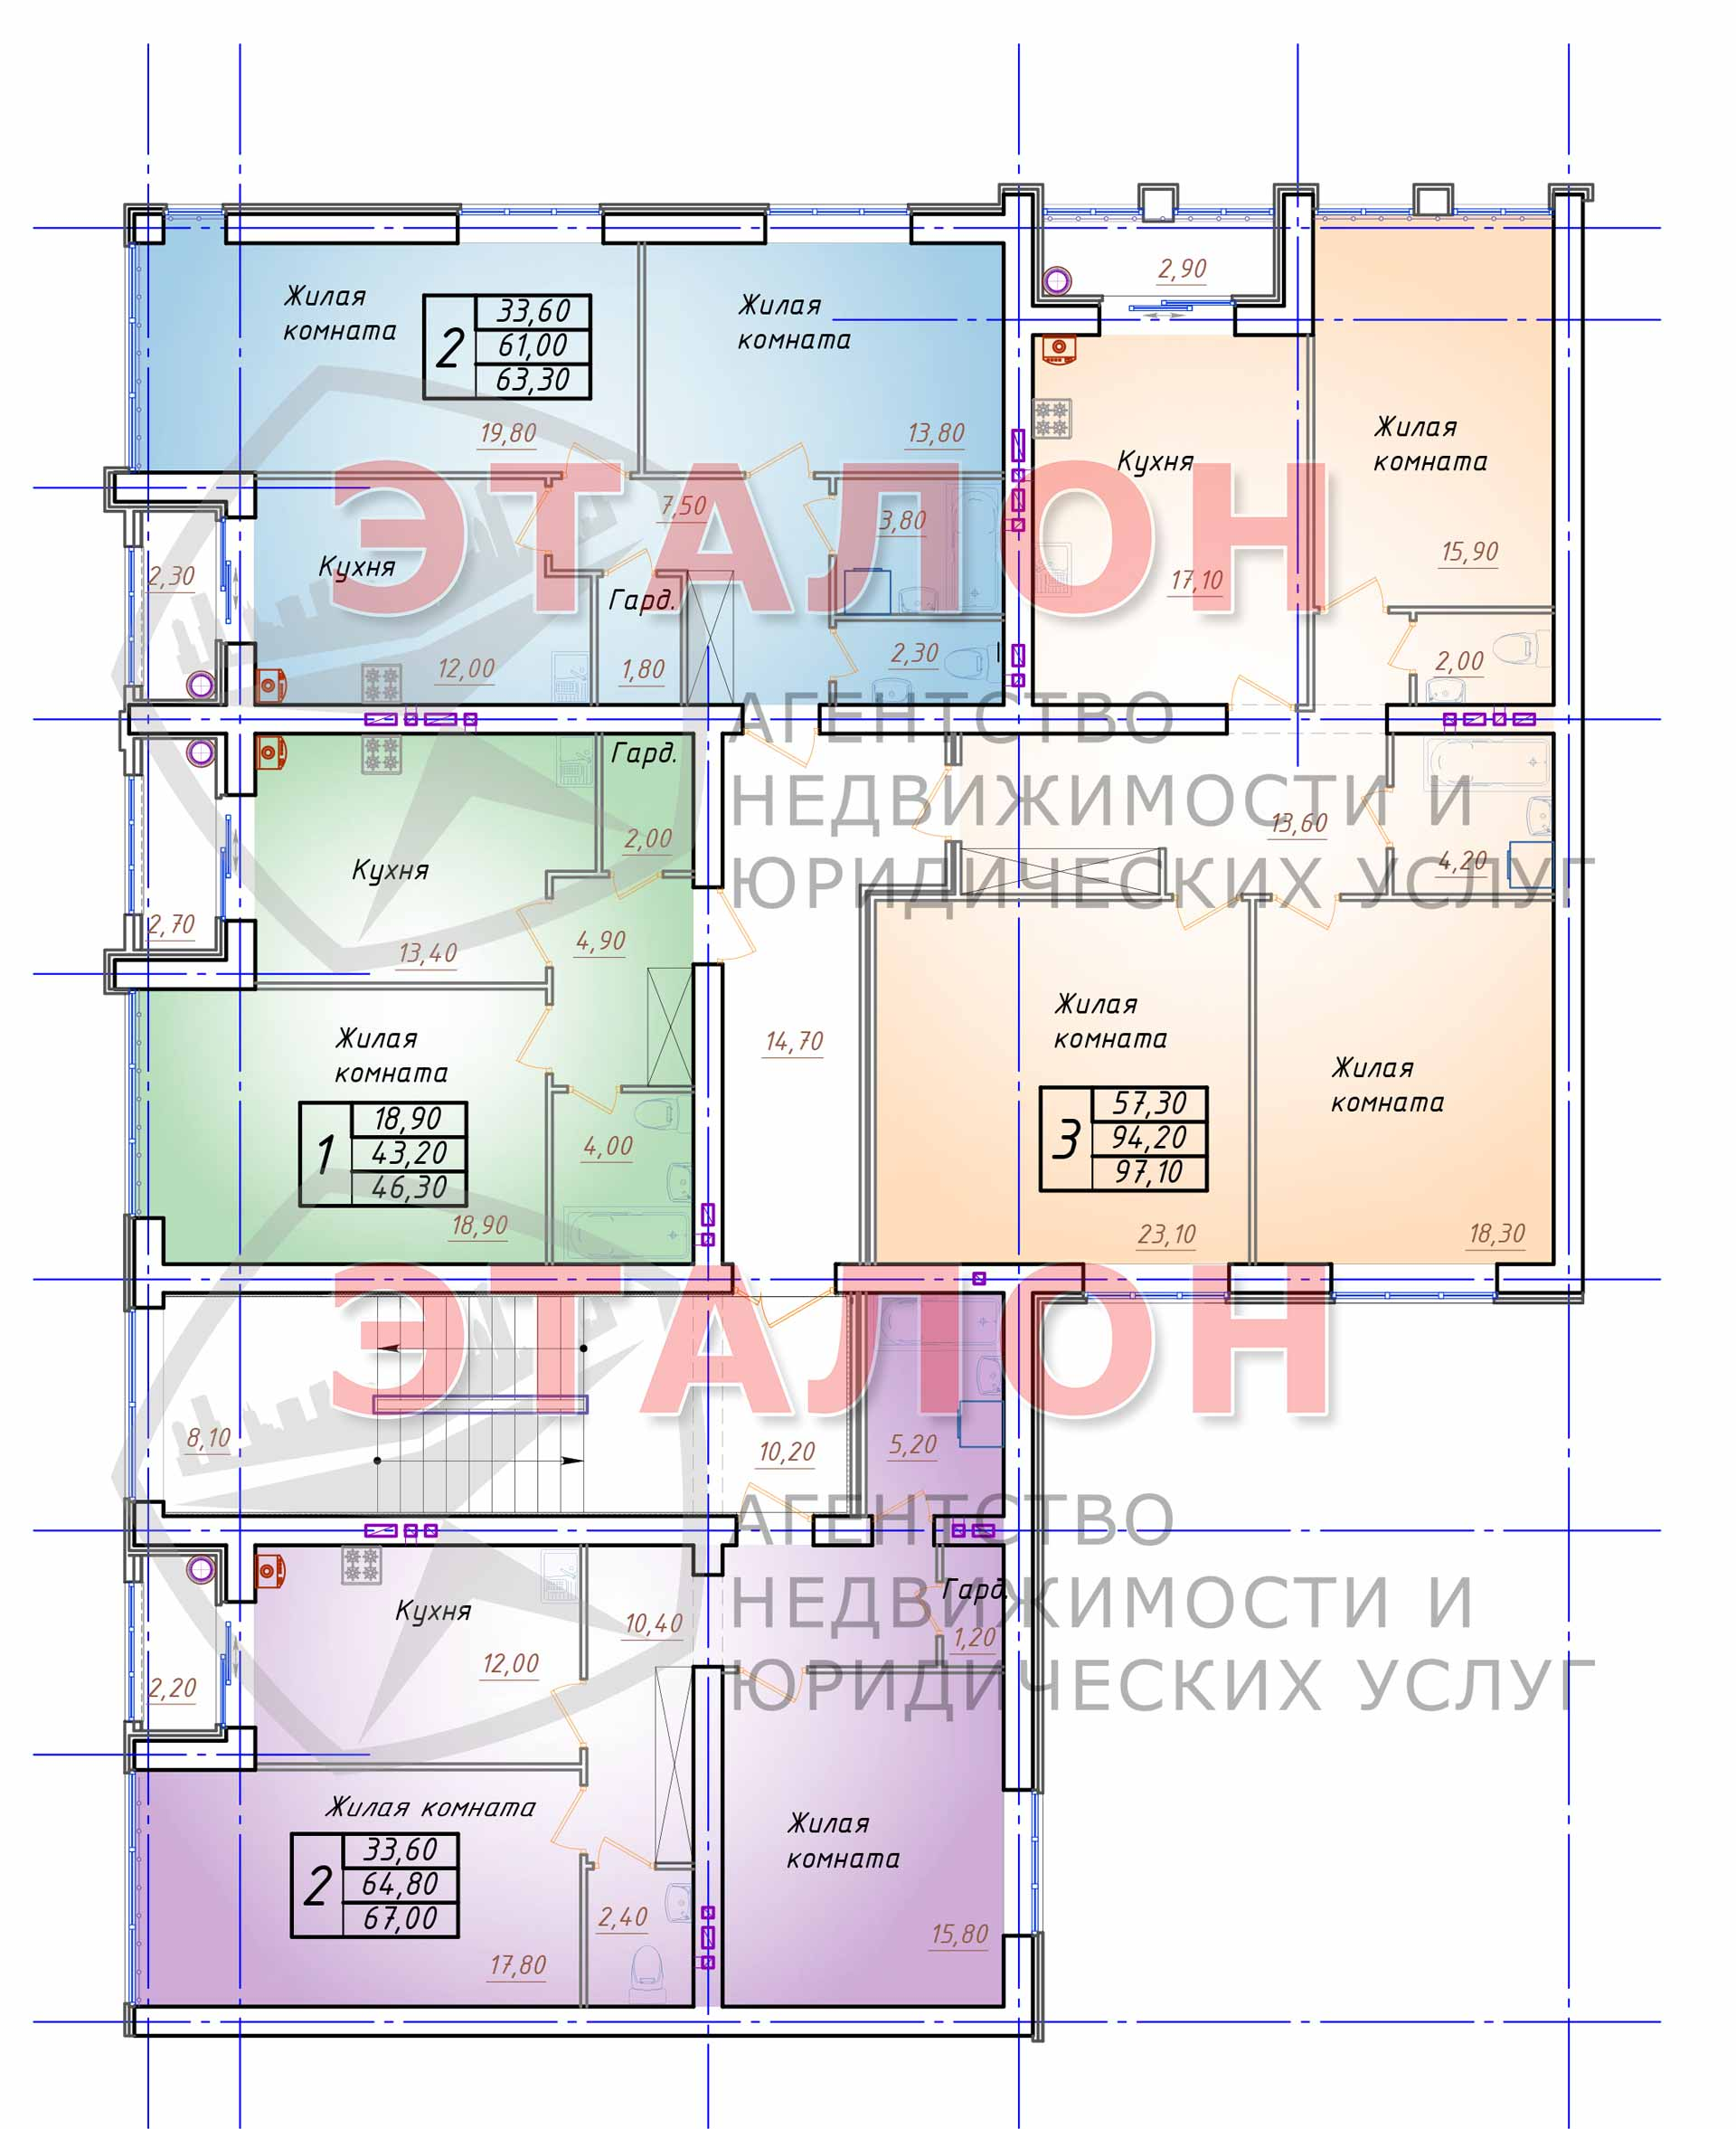 Блок 3. Подъезд 3. План 4-го этажа